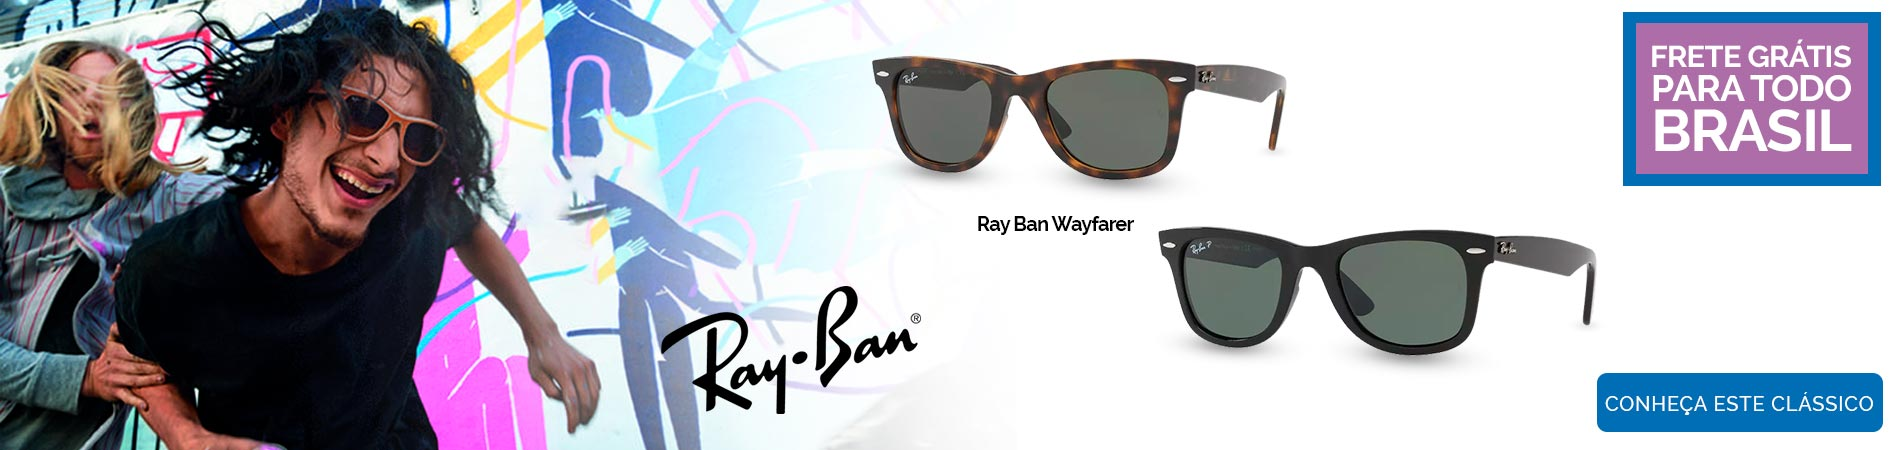 Banner RayBan